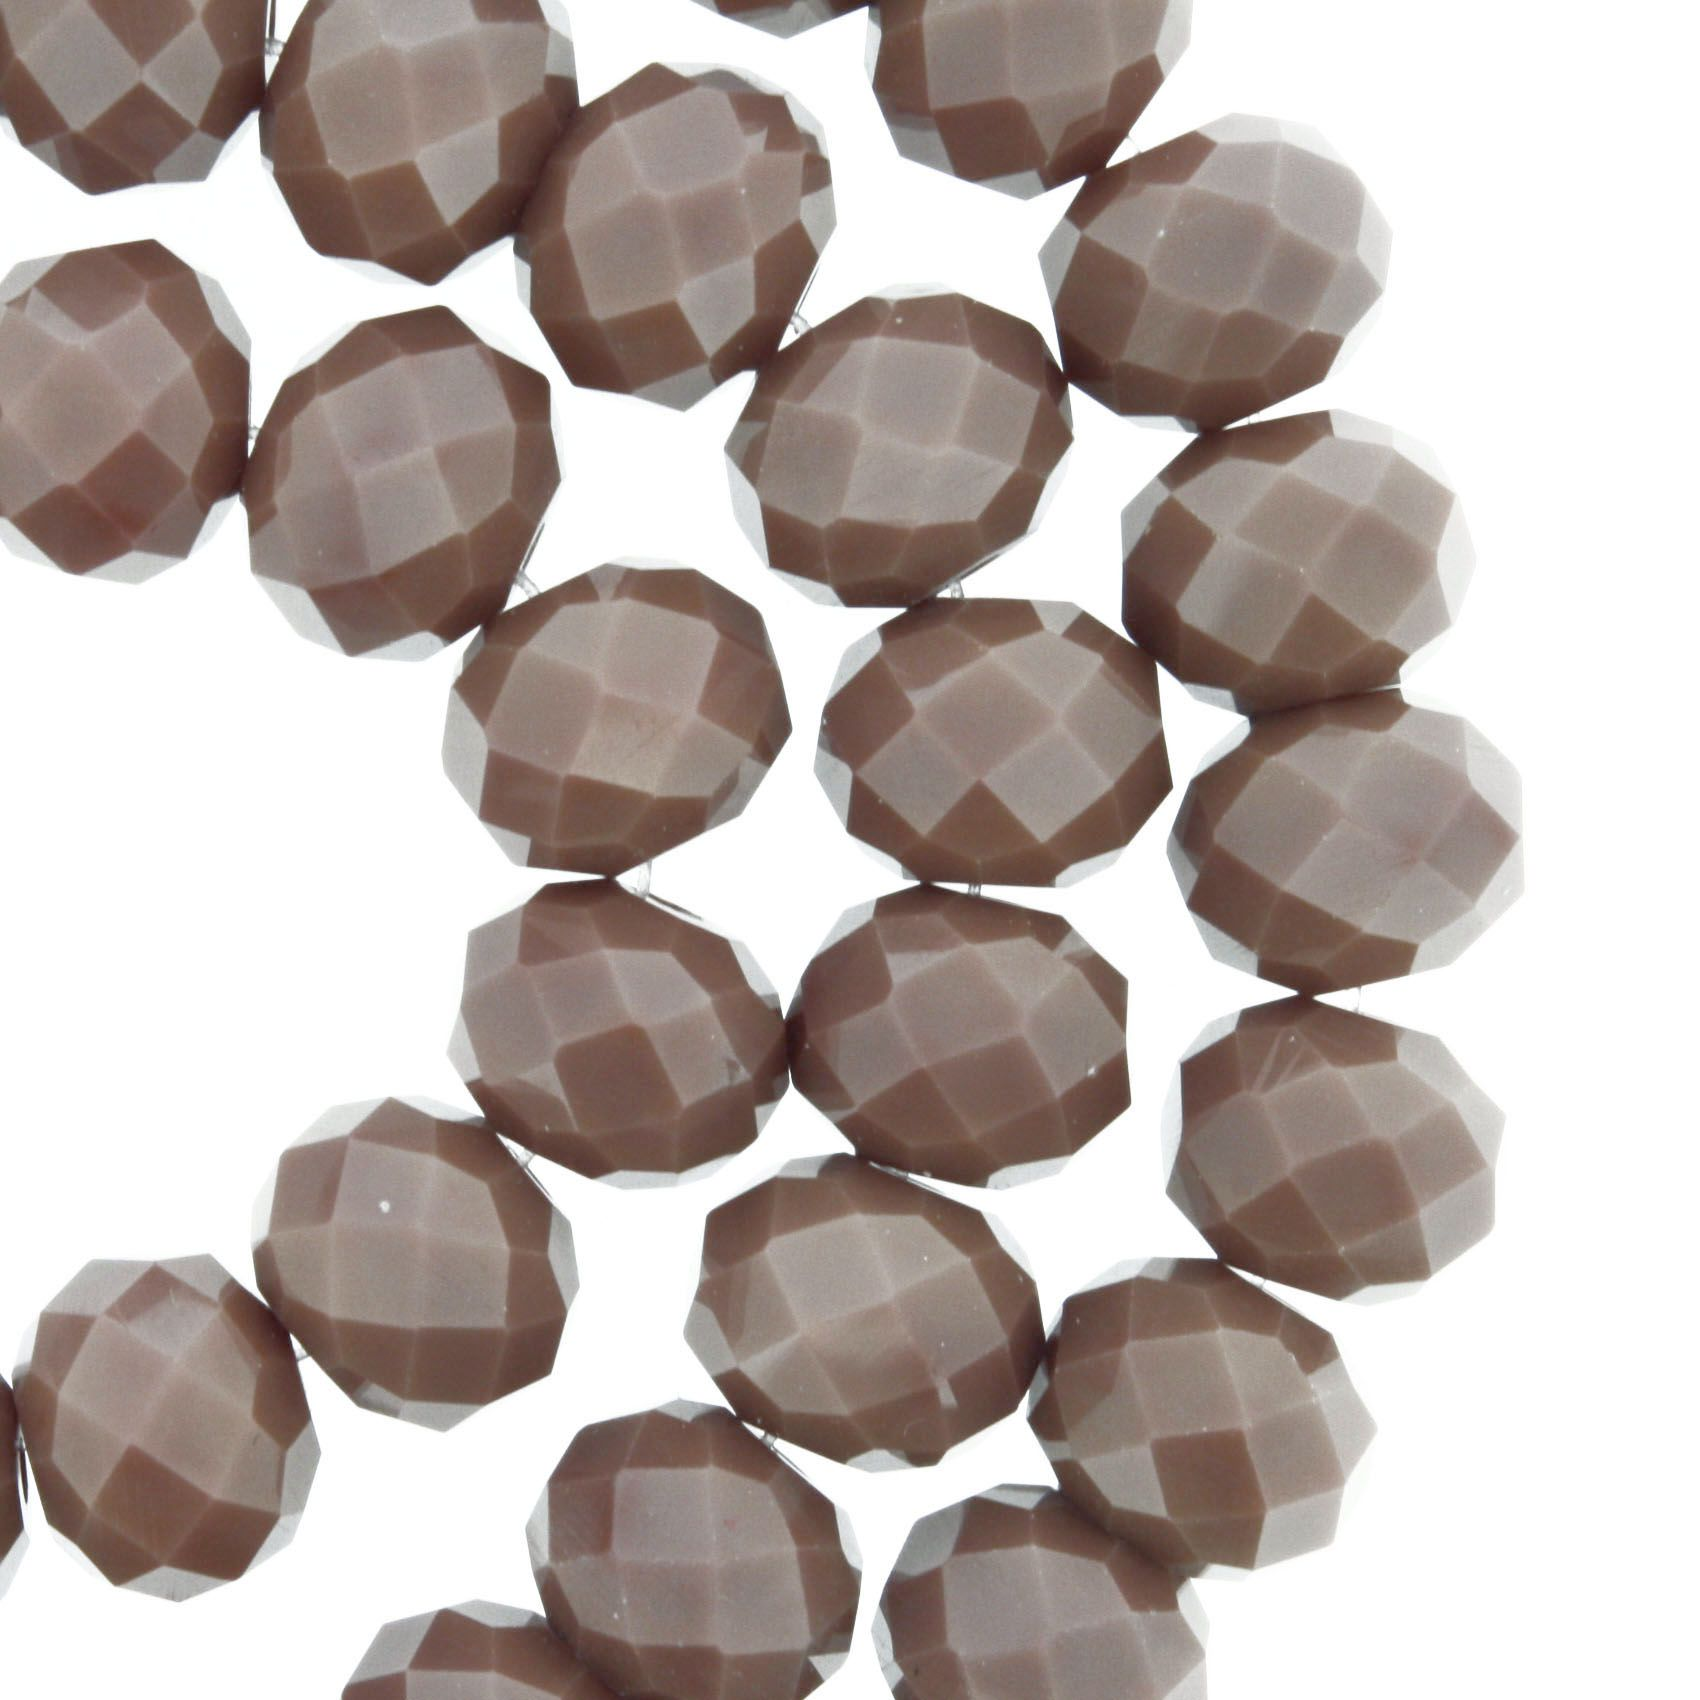 Fio de Cristal - Flat® - Marrom - 10mm  - Stéphanie Bijoux® - Peças para Bijuterias e Artesanato